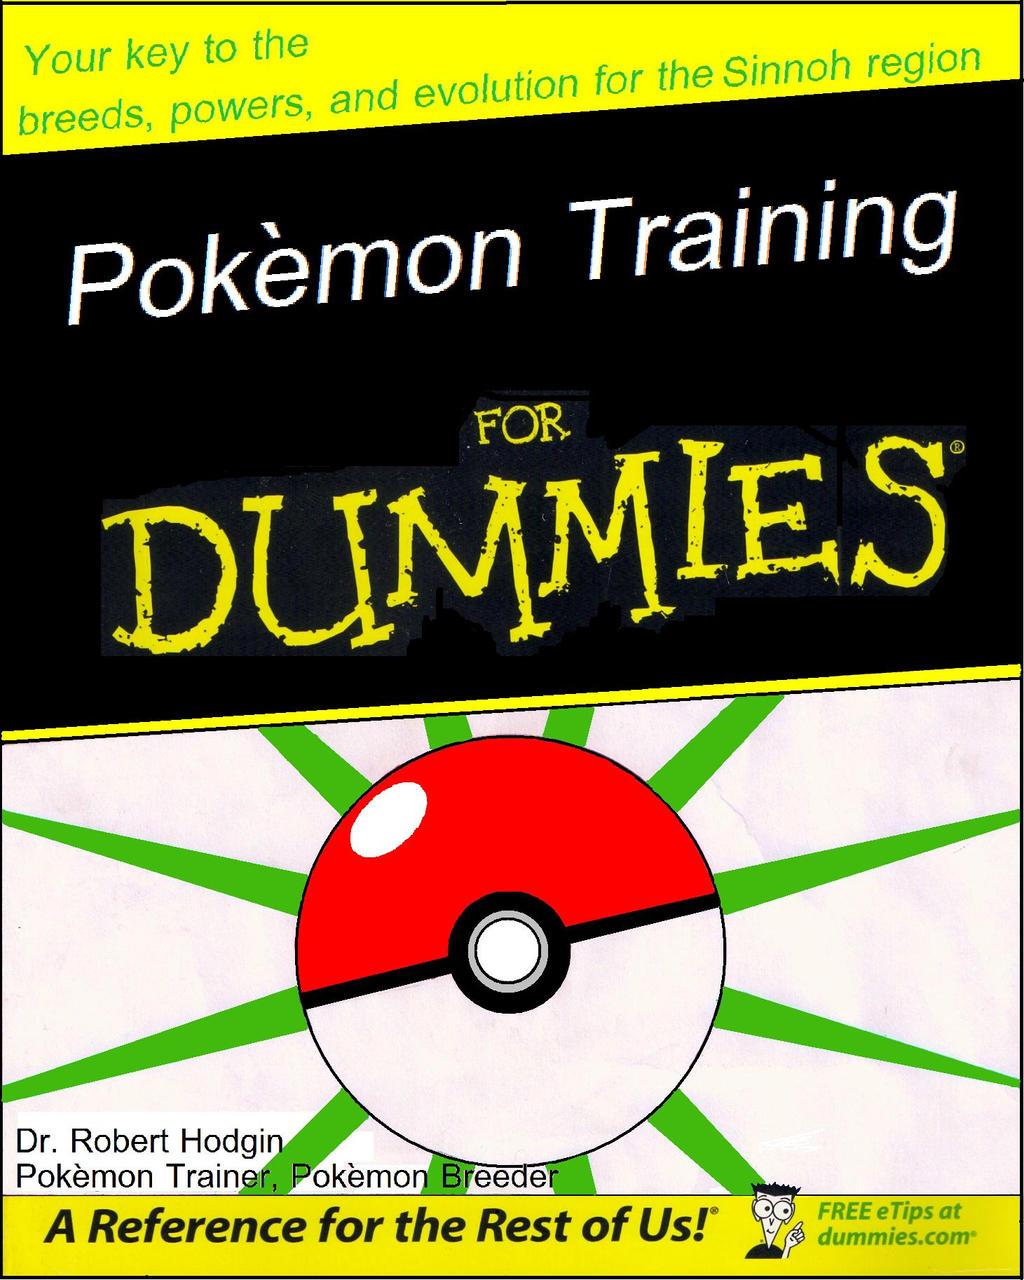 http://img01.deviantart.net/599f/i/2008/293/8/f/pokemon_training_for_dummies_by_azaniadragon.jpg